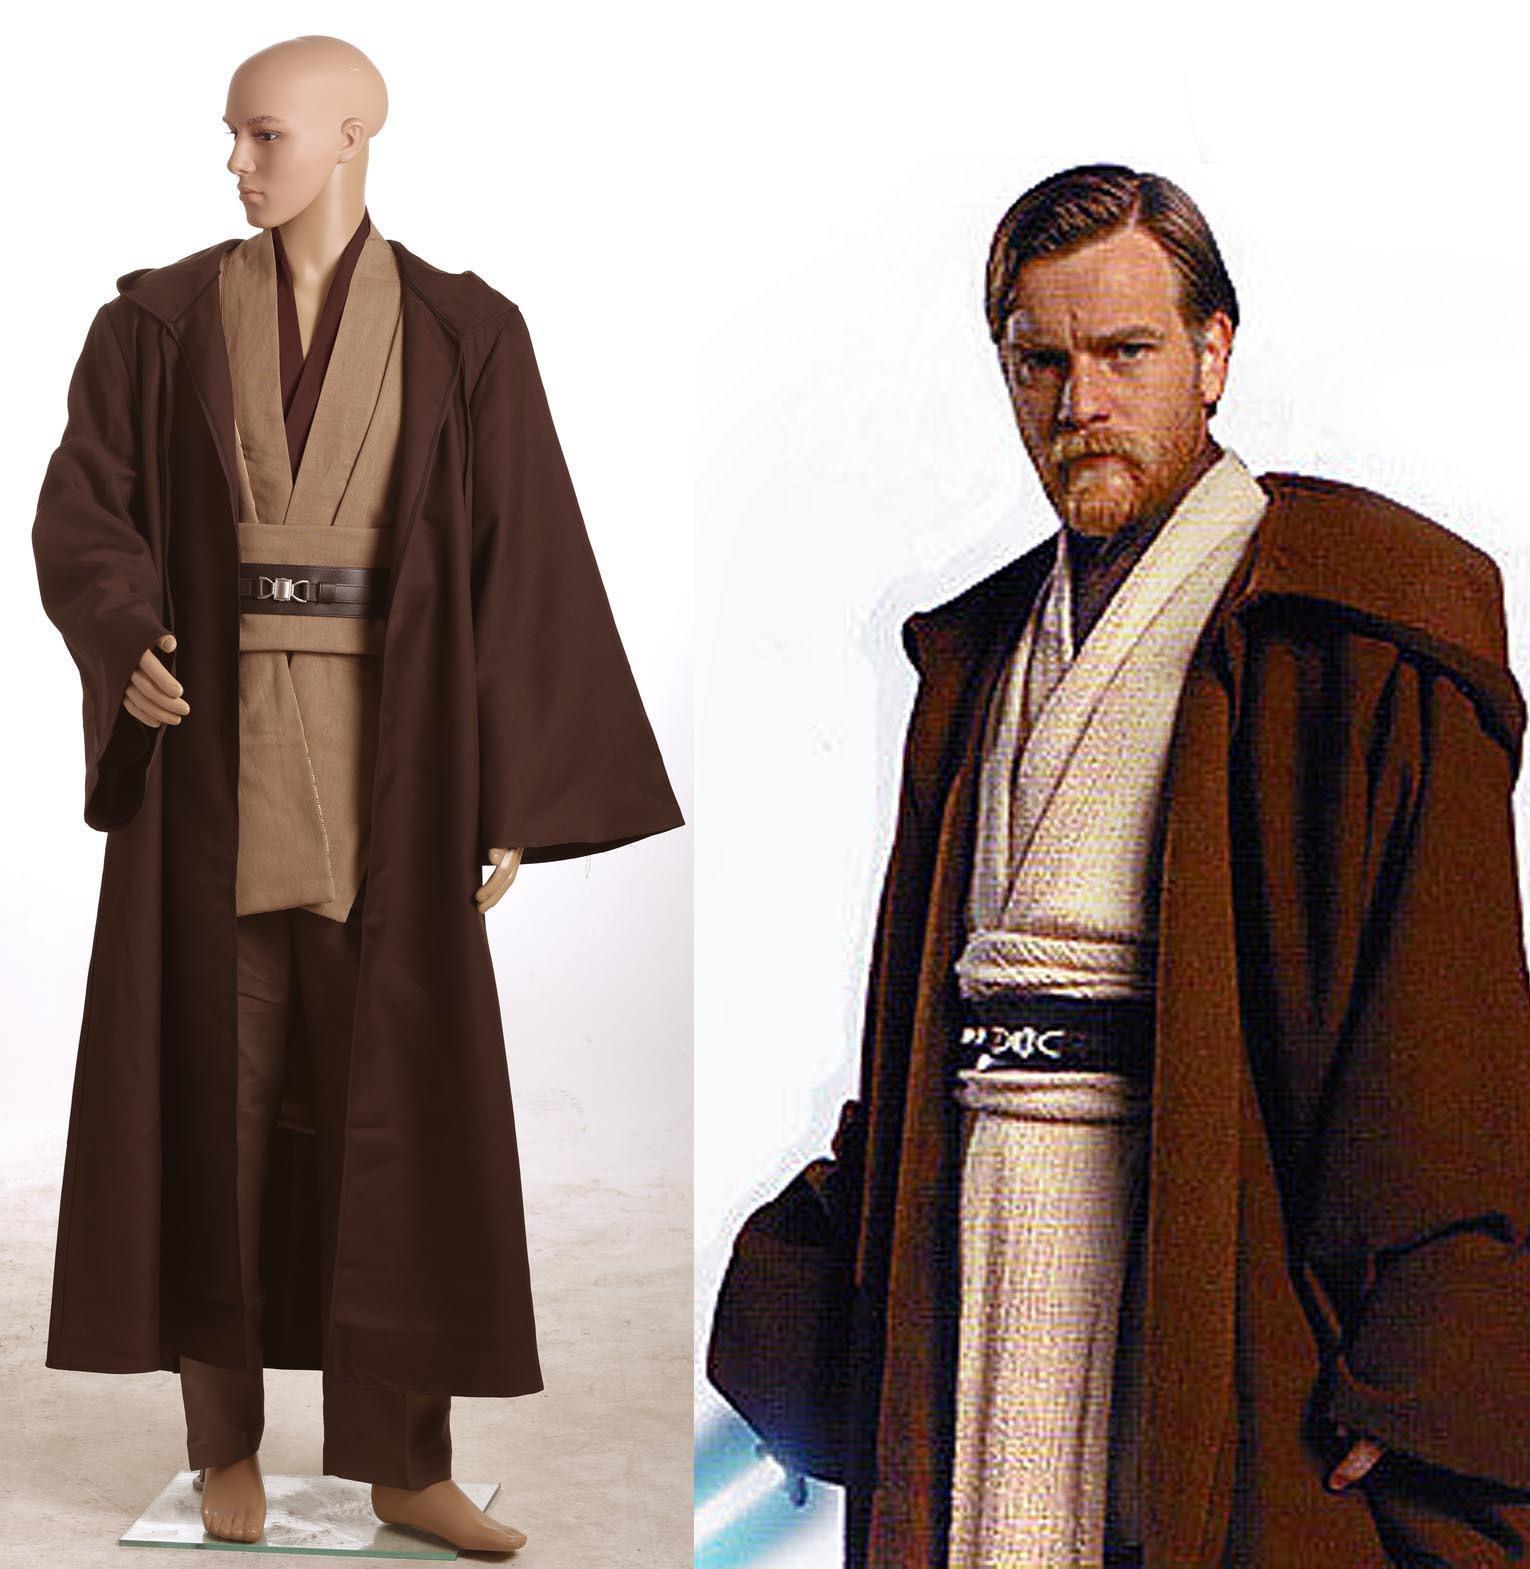 Star Wars Obi Wan Kenobi Jedi Tunic Costume New Version Halloween ...